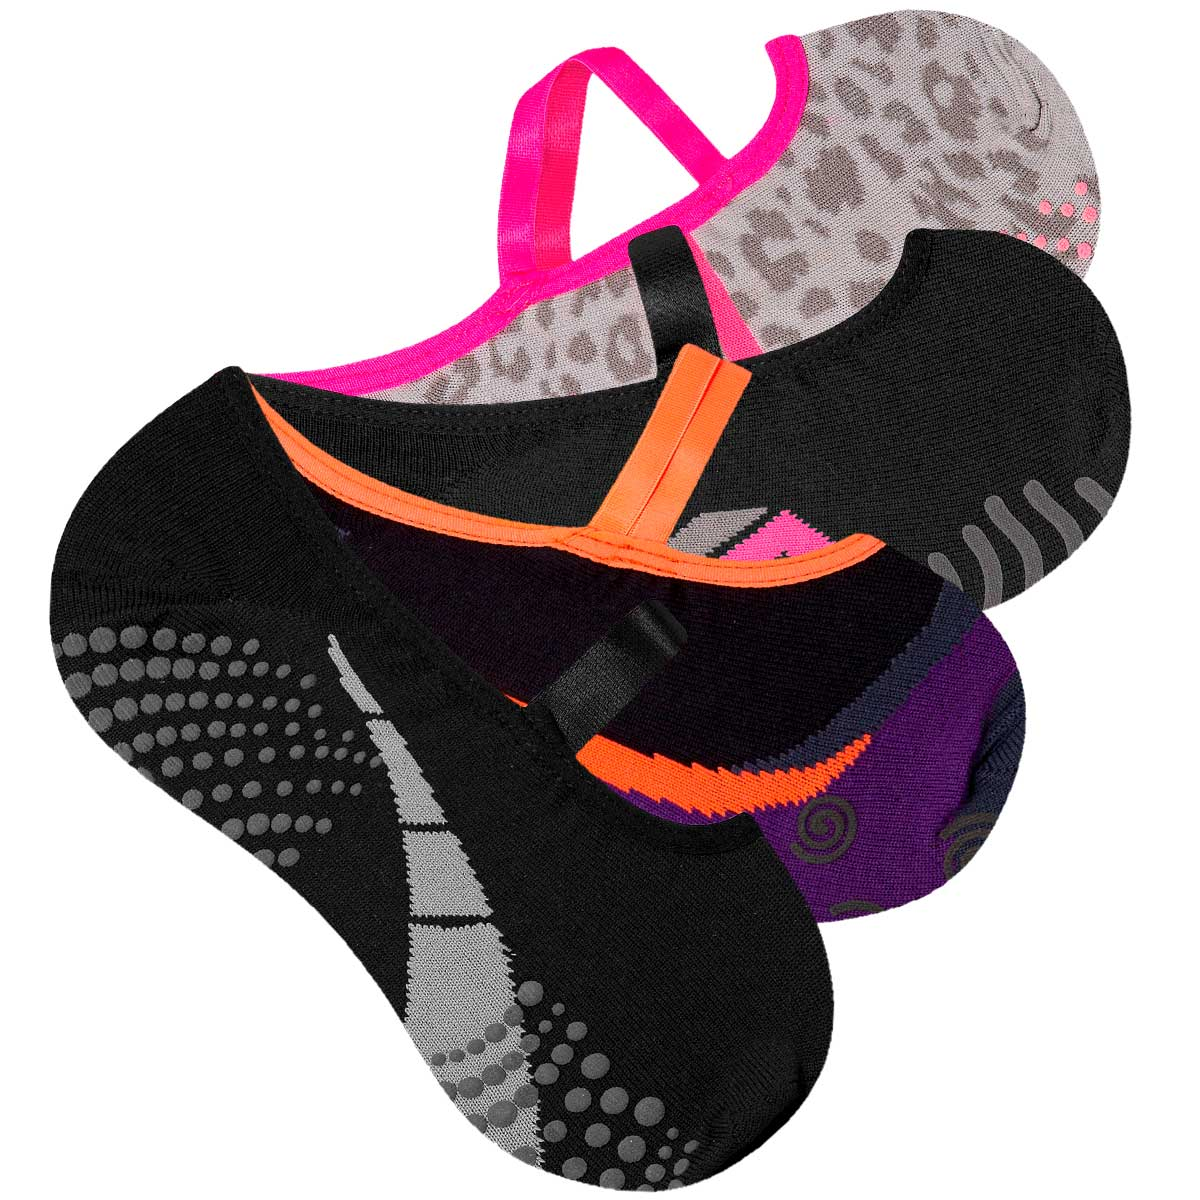 Kit 4 Pares de Meias Sapatilha Pilates Antiderrapante Feminina Yoga